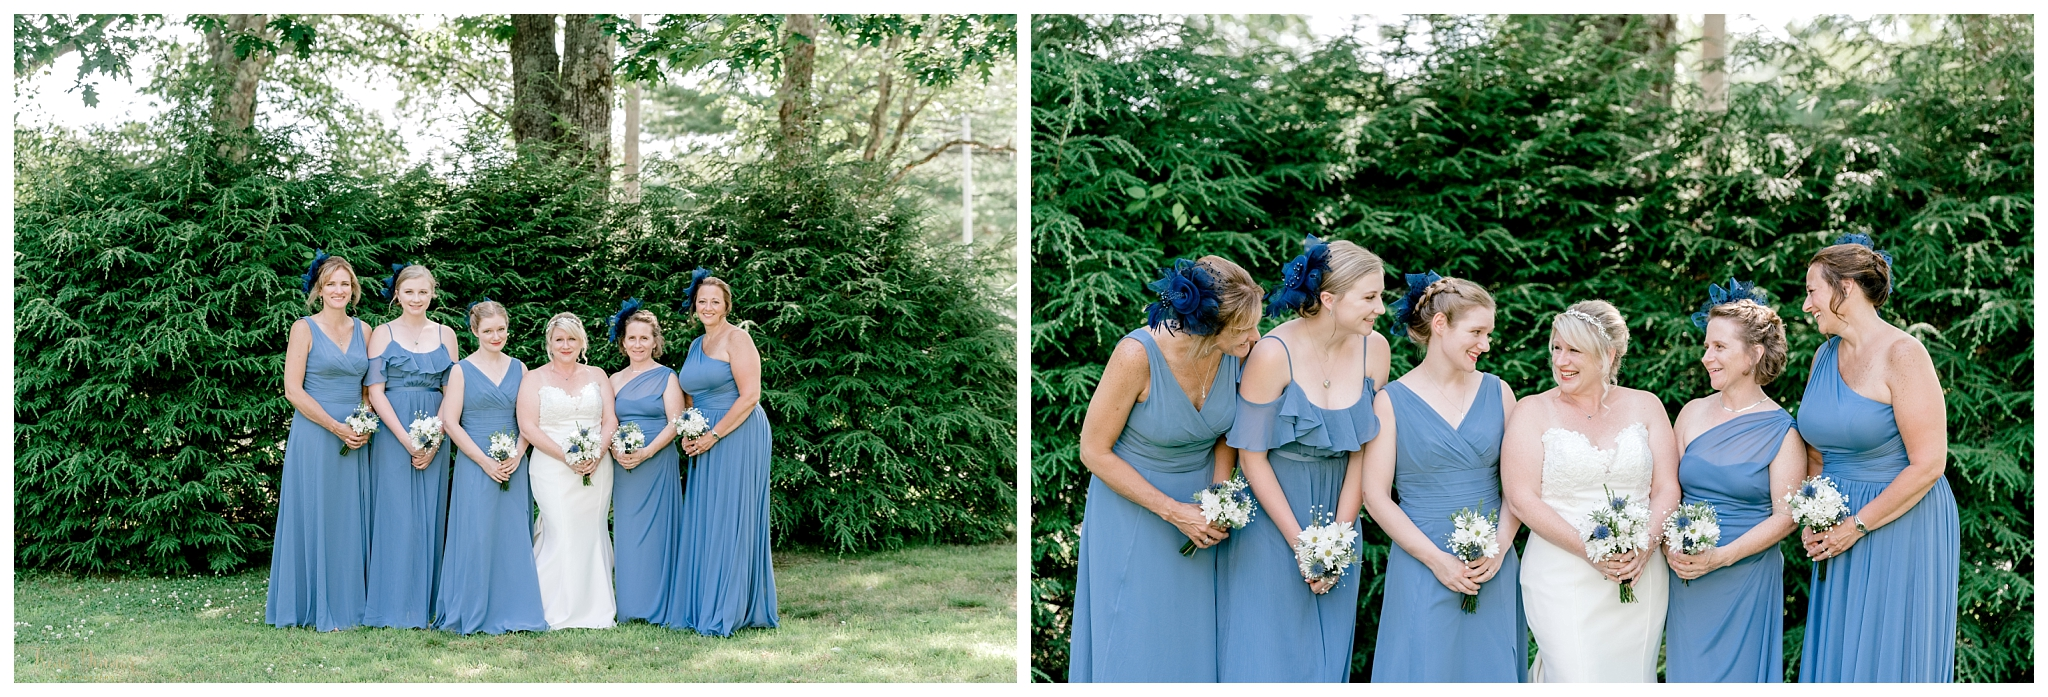 Blue Scottish Influenced Bridesmaids Wedding Accessories